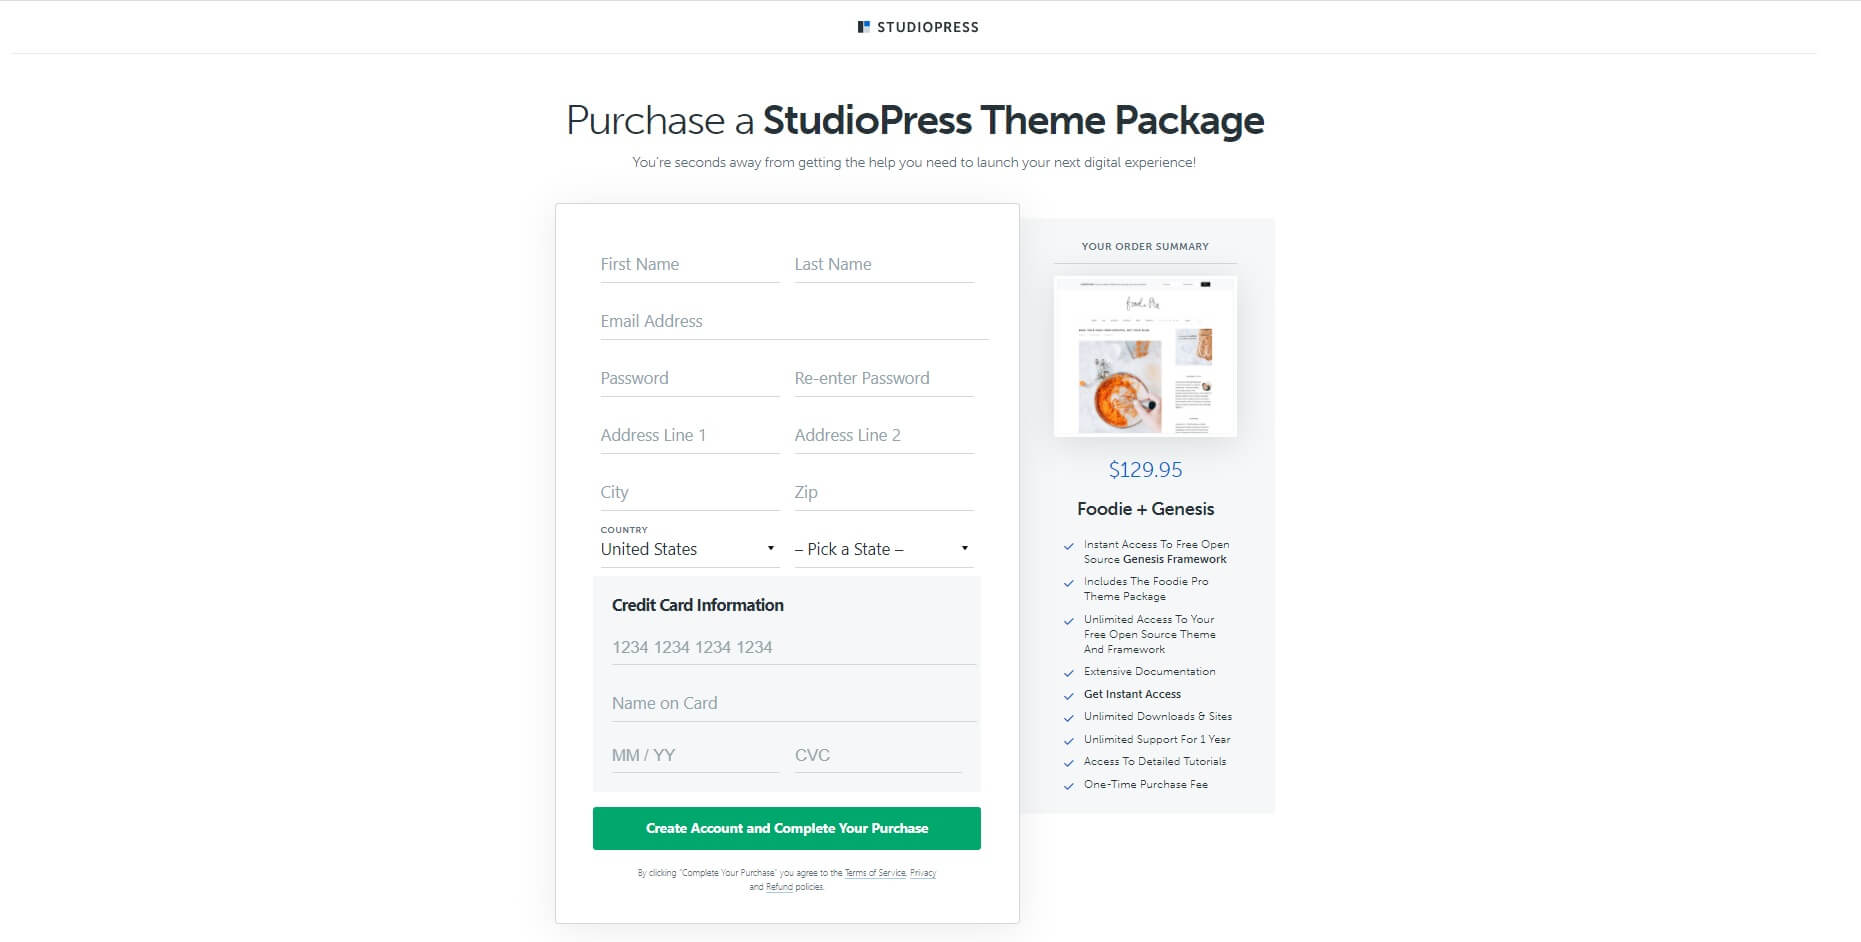 studiopress foodie pro theme purchase